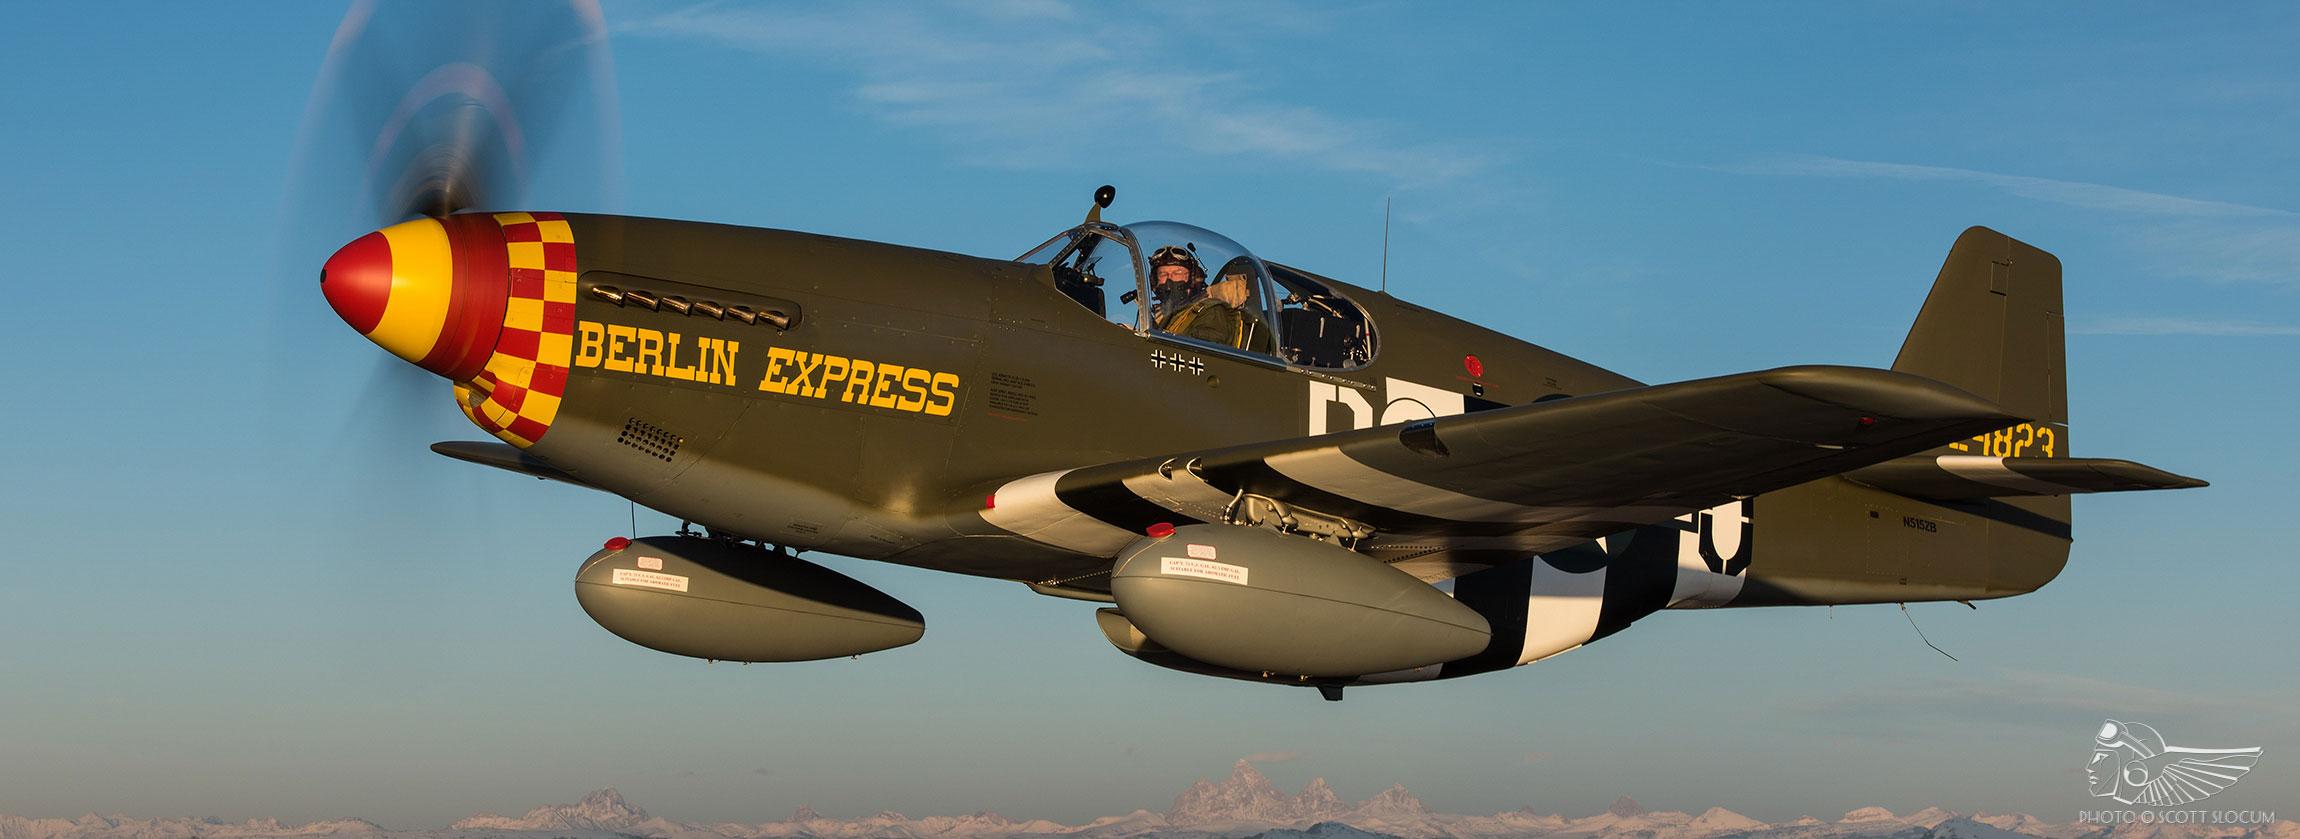 P 51b Berlin Express Begins Transatlantic Crossing The